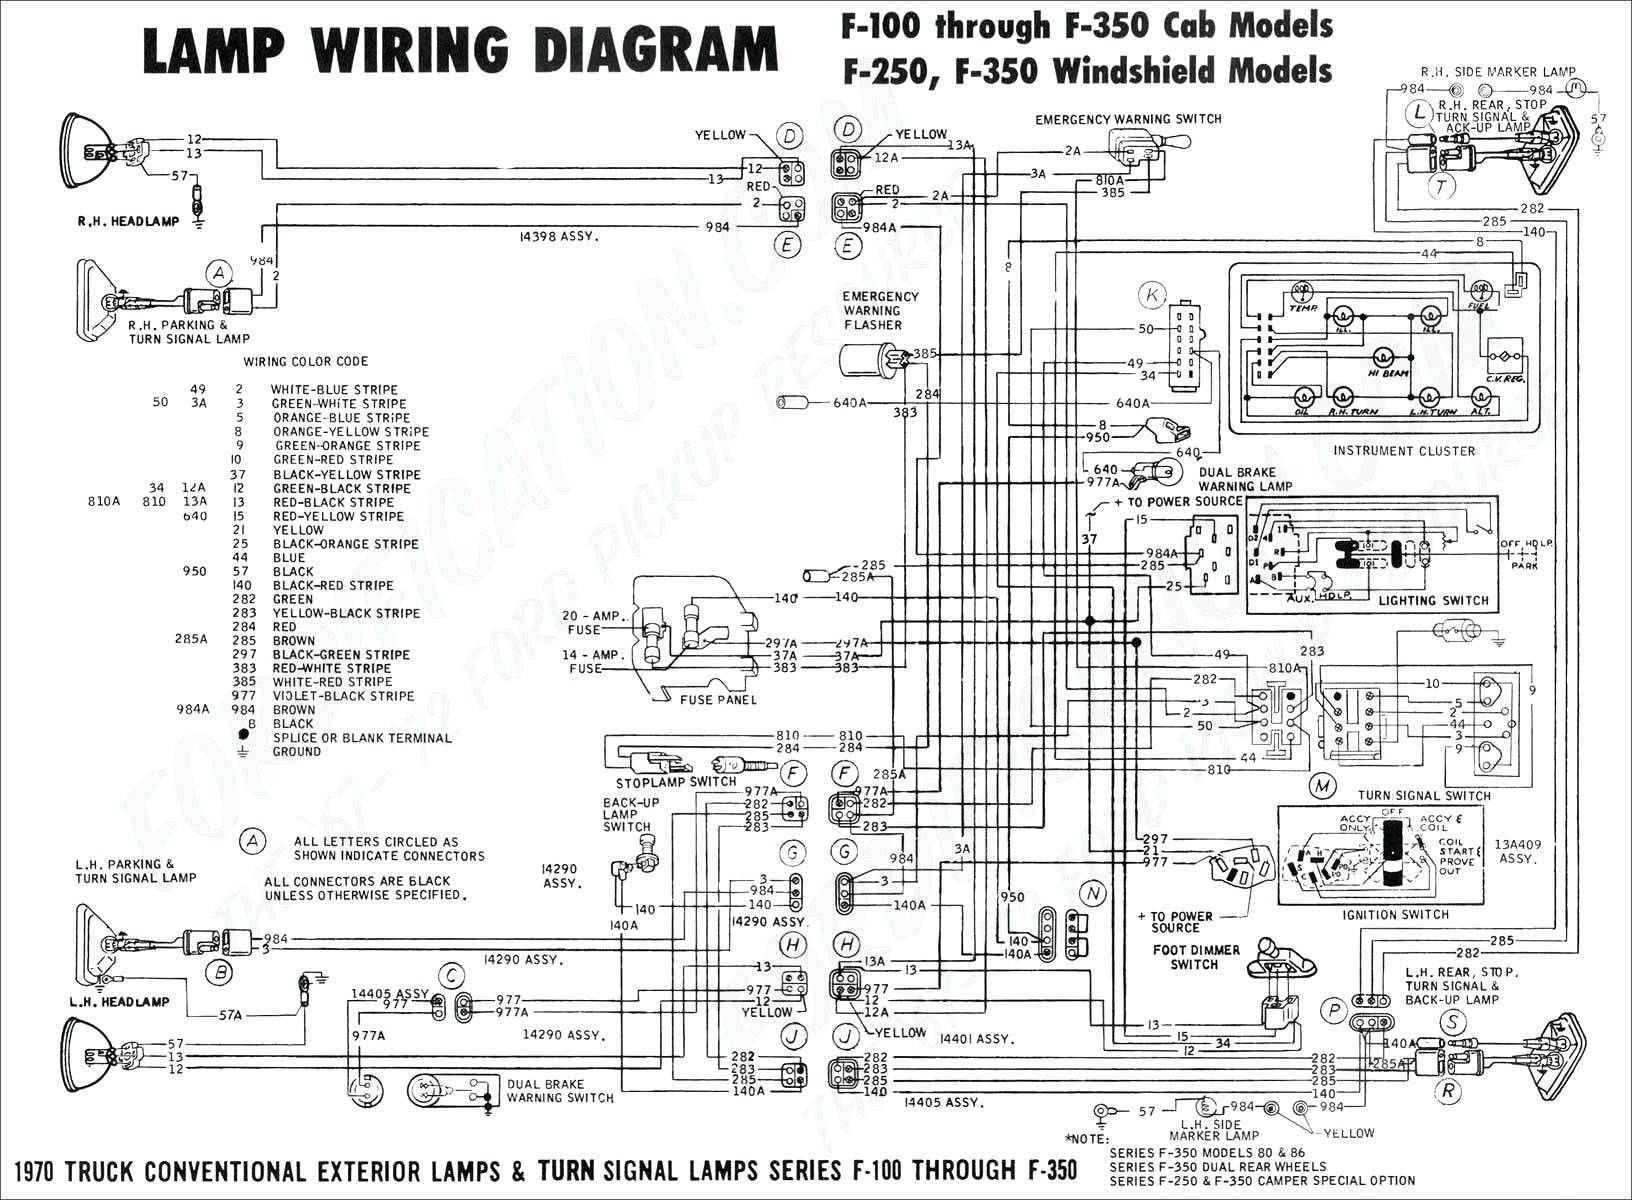 2003 Ram Running Light Schematic Download] 2000 Dodge Ram Reverse Light Wiring Diagram Hd Of 2003 Ram Running Light Schematic